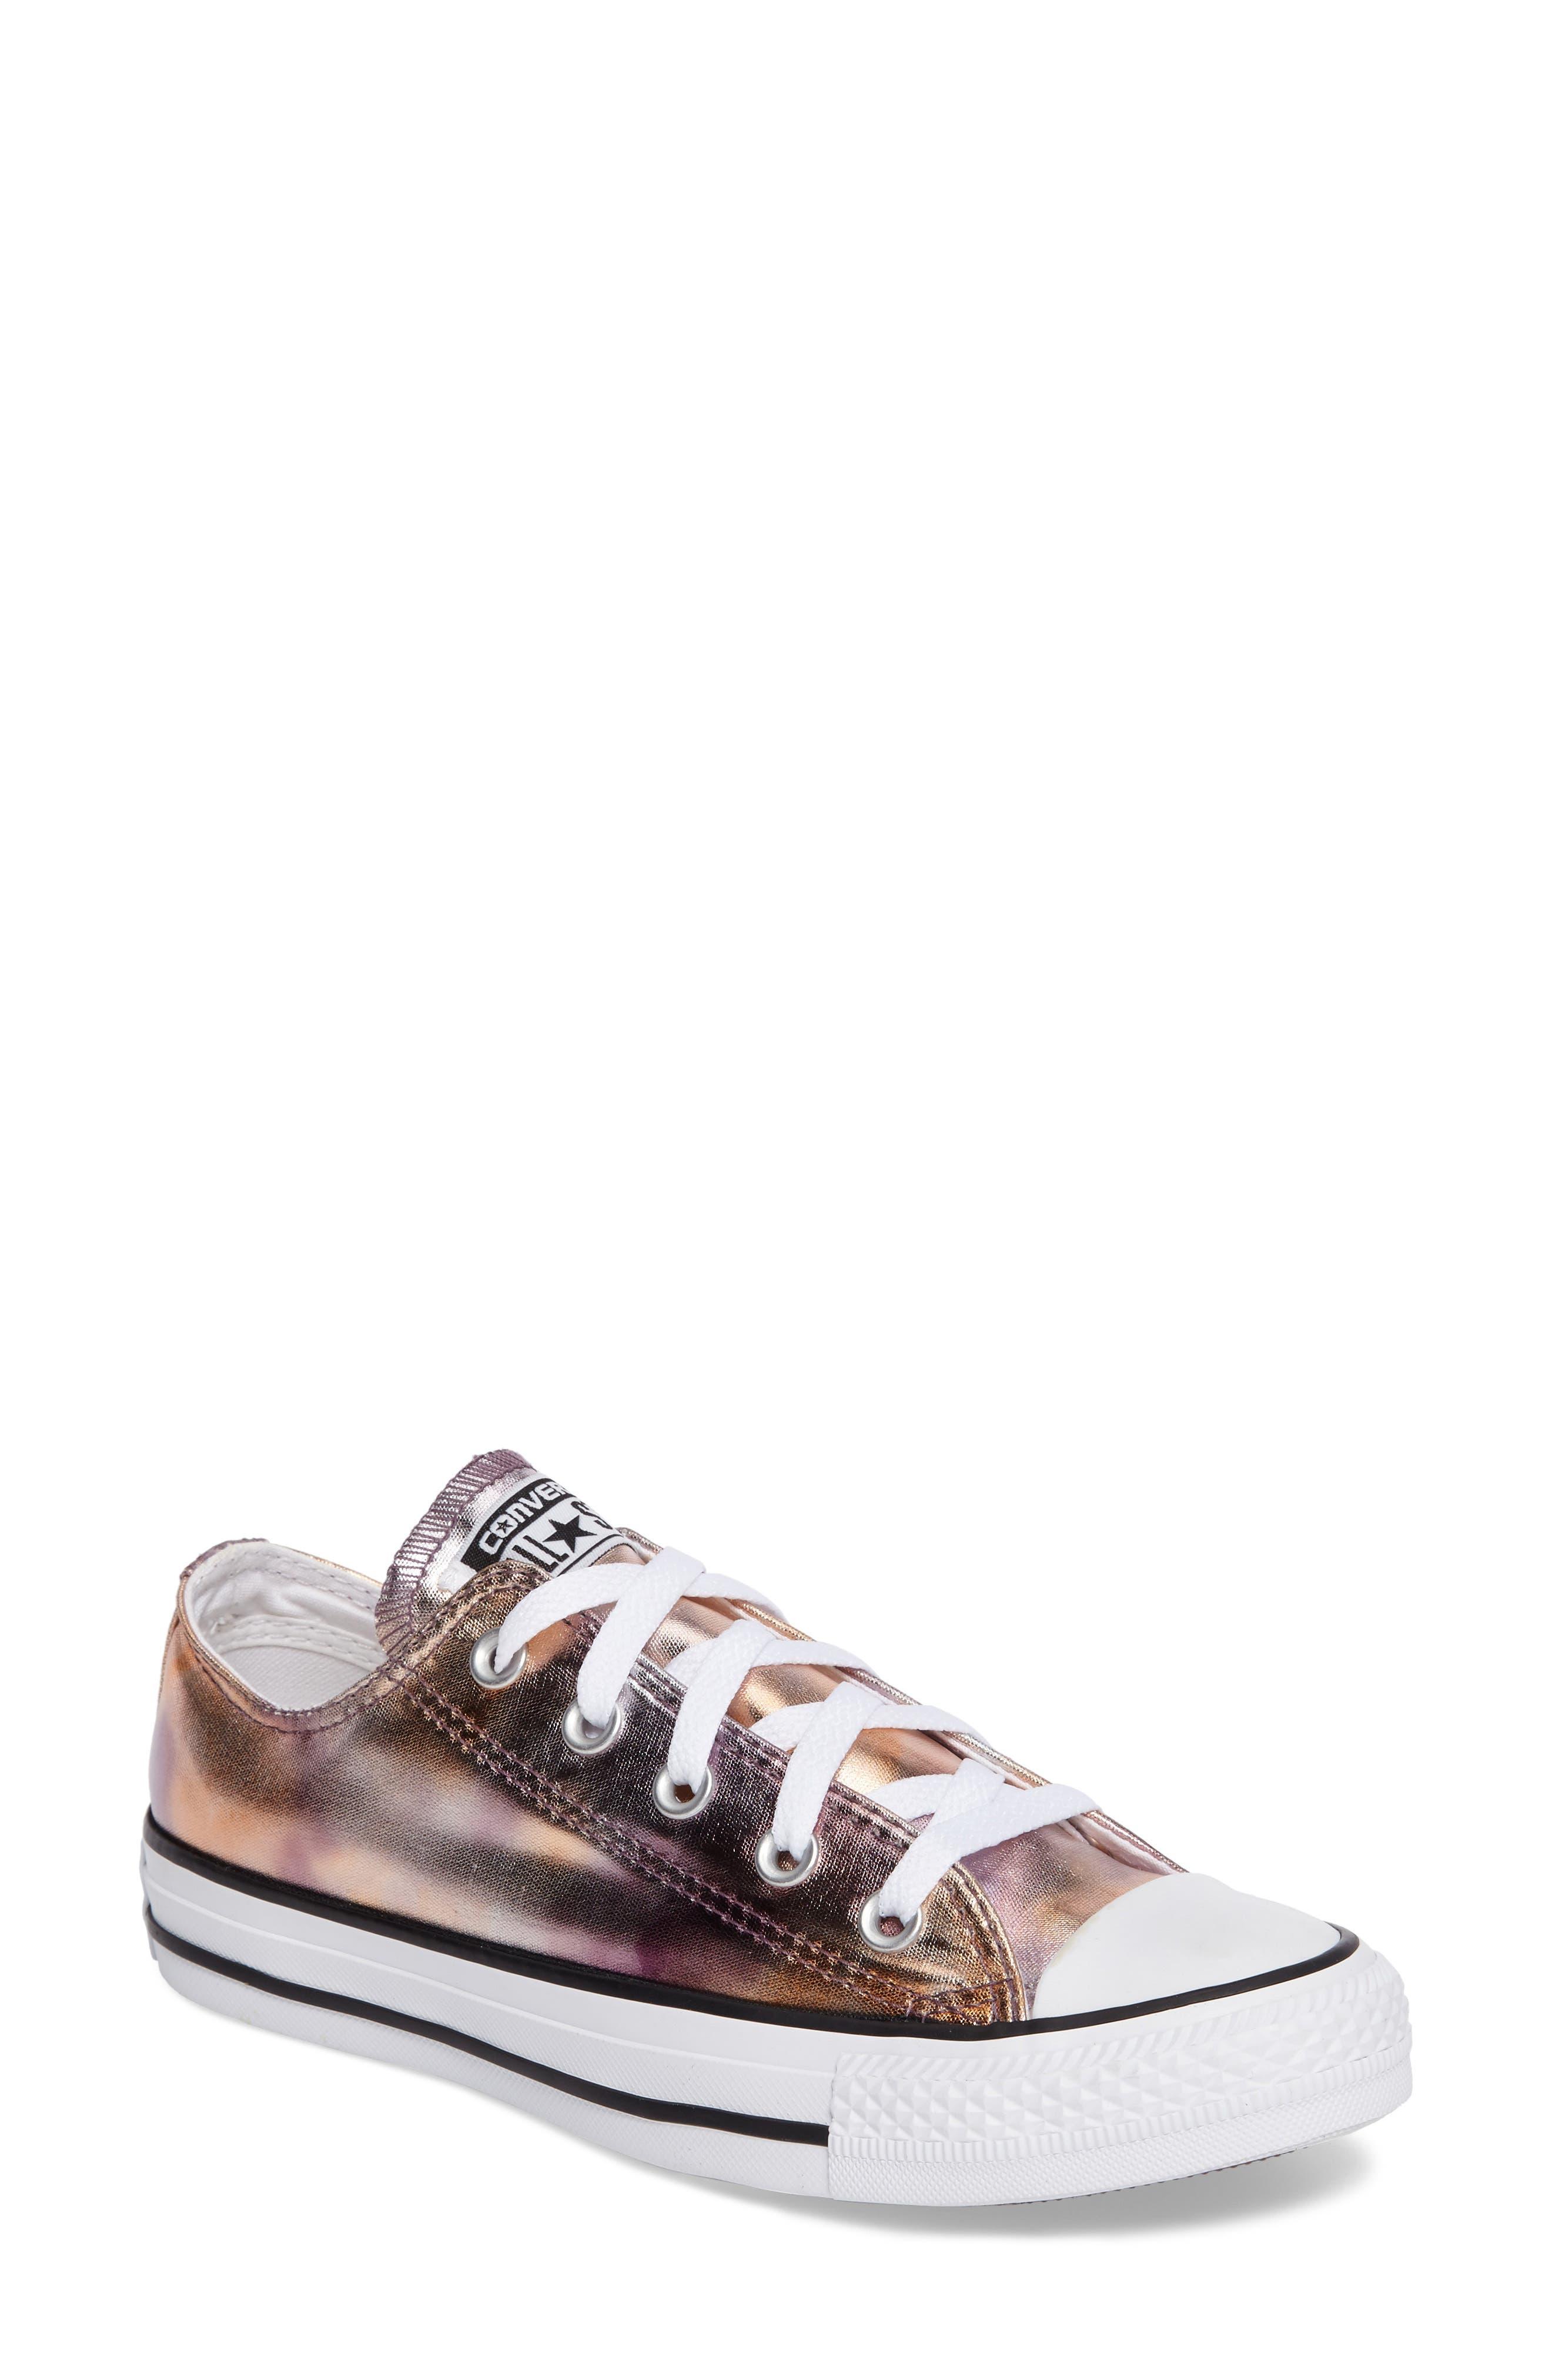 Converse Chuck Taylor® All Star® Seasonal Metallic Ox Low Top Sneaker (Women)